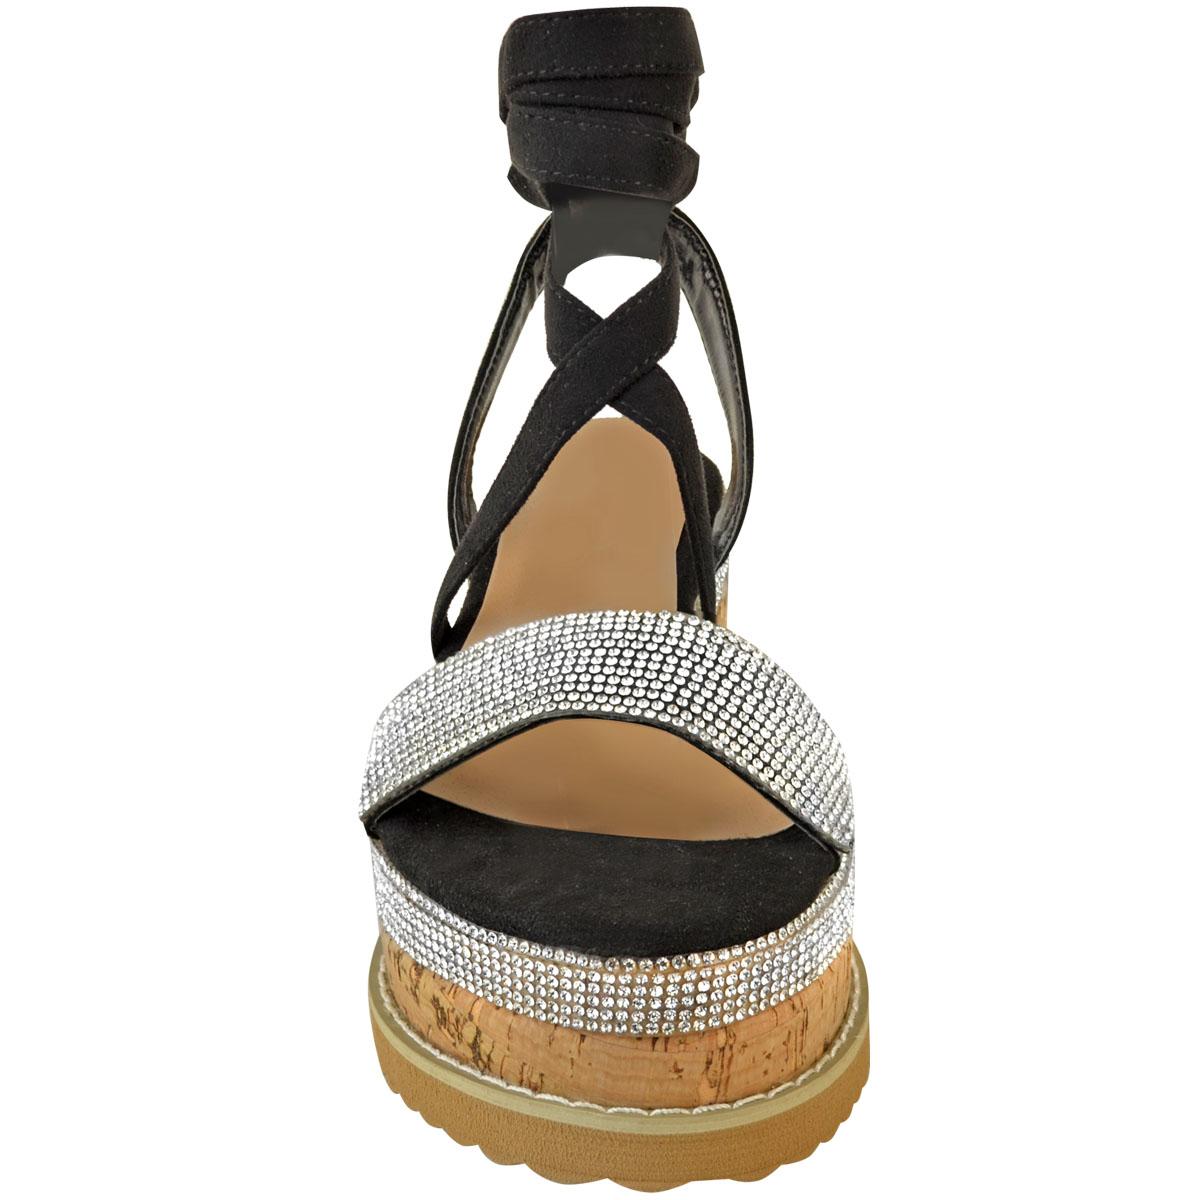 Womens-Ladies-Flatform-Diamante-Wedge-Sandals-Platform-Ankle-Lace-Up-Summer-Size thumbnail 6